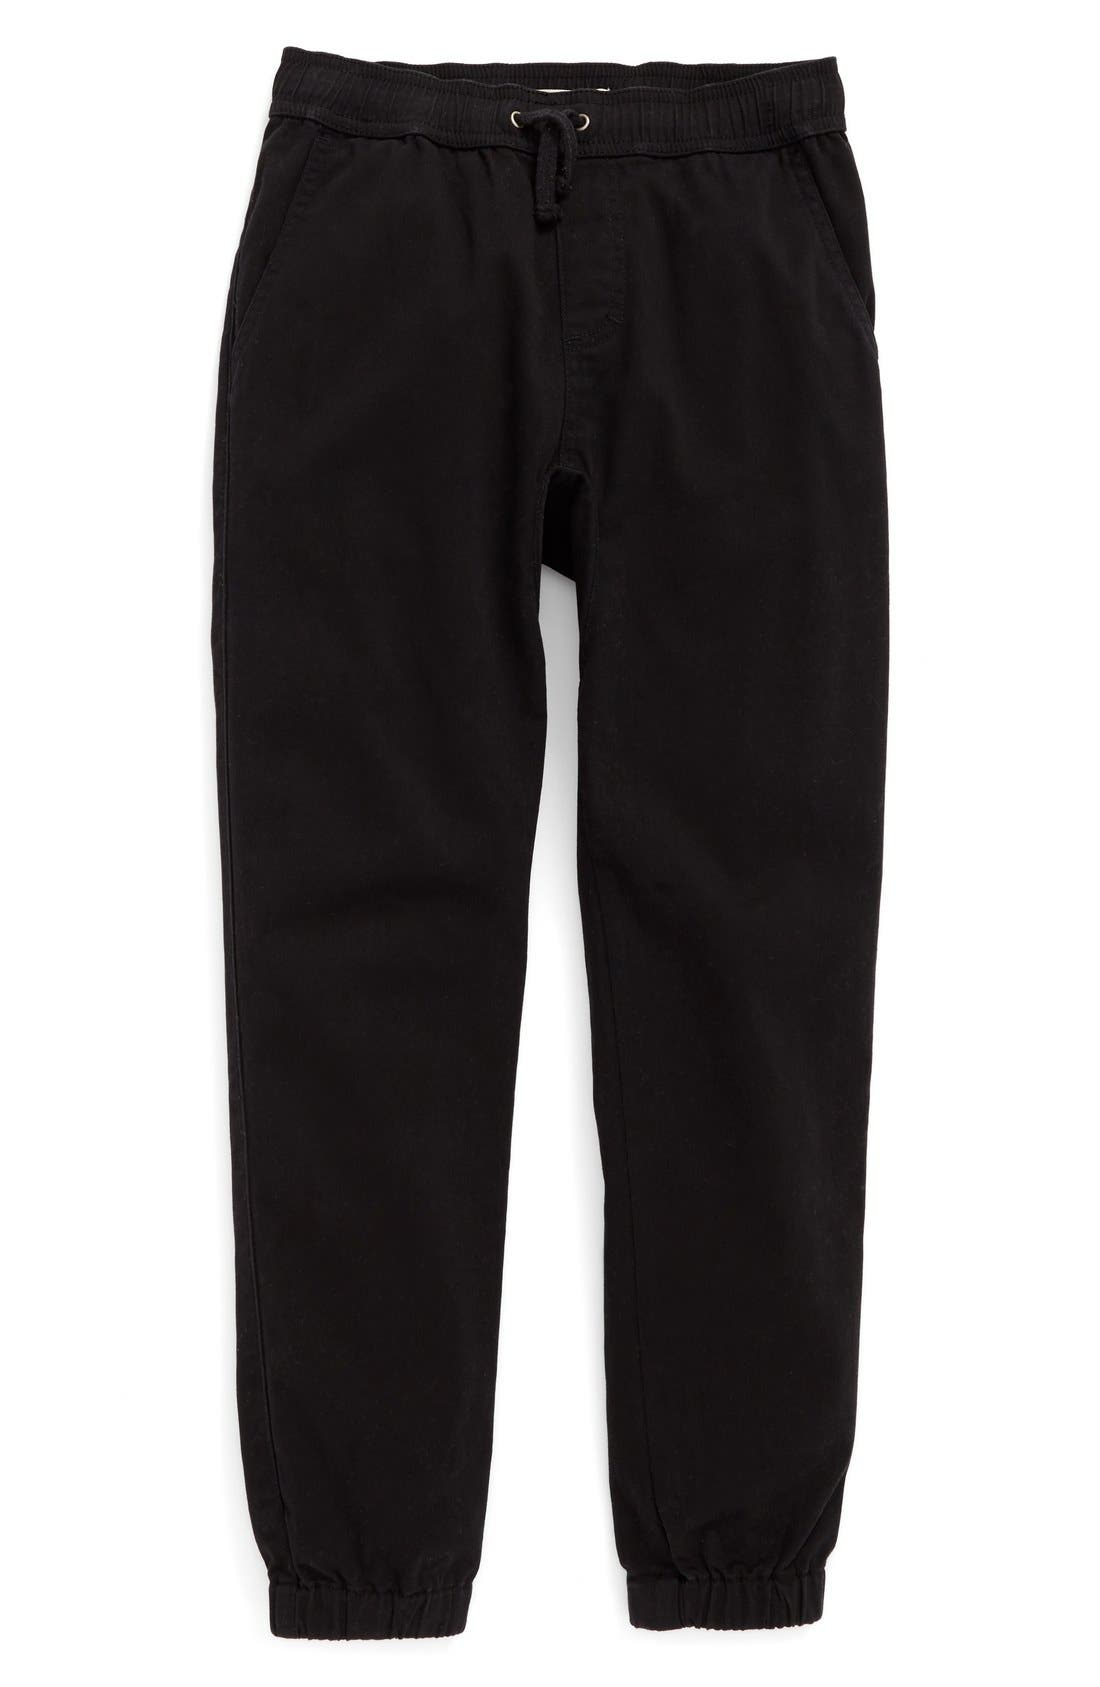 Alternate Image 1 Selected - Tucker + Tate Woven Jogger Pants (Toddler Boys, Little Boys & Big Boys)